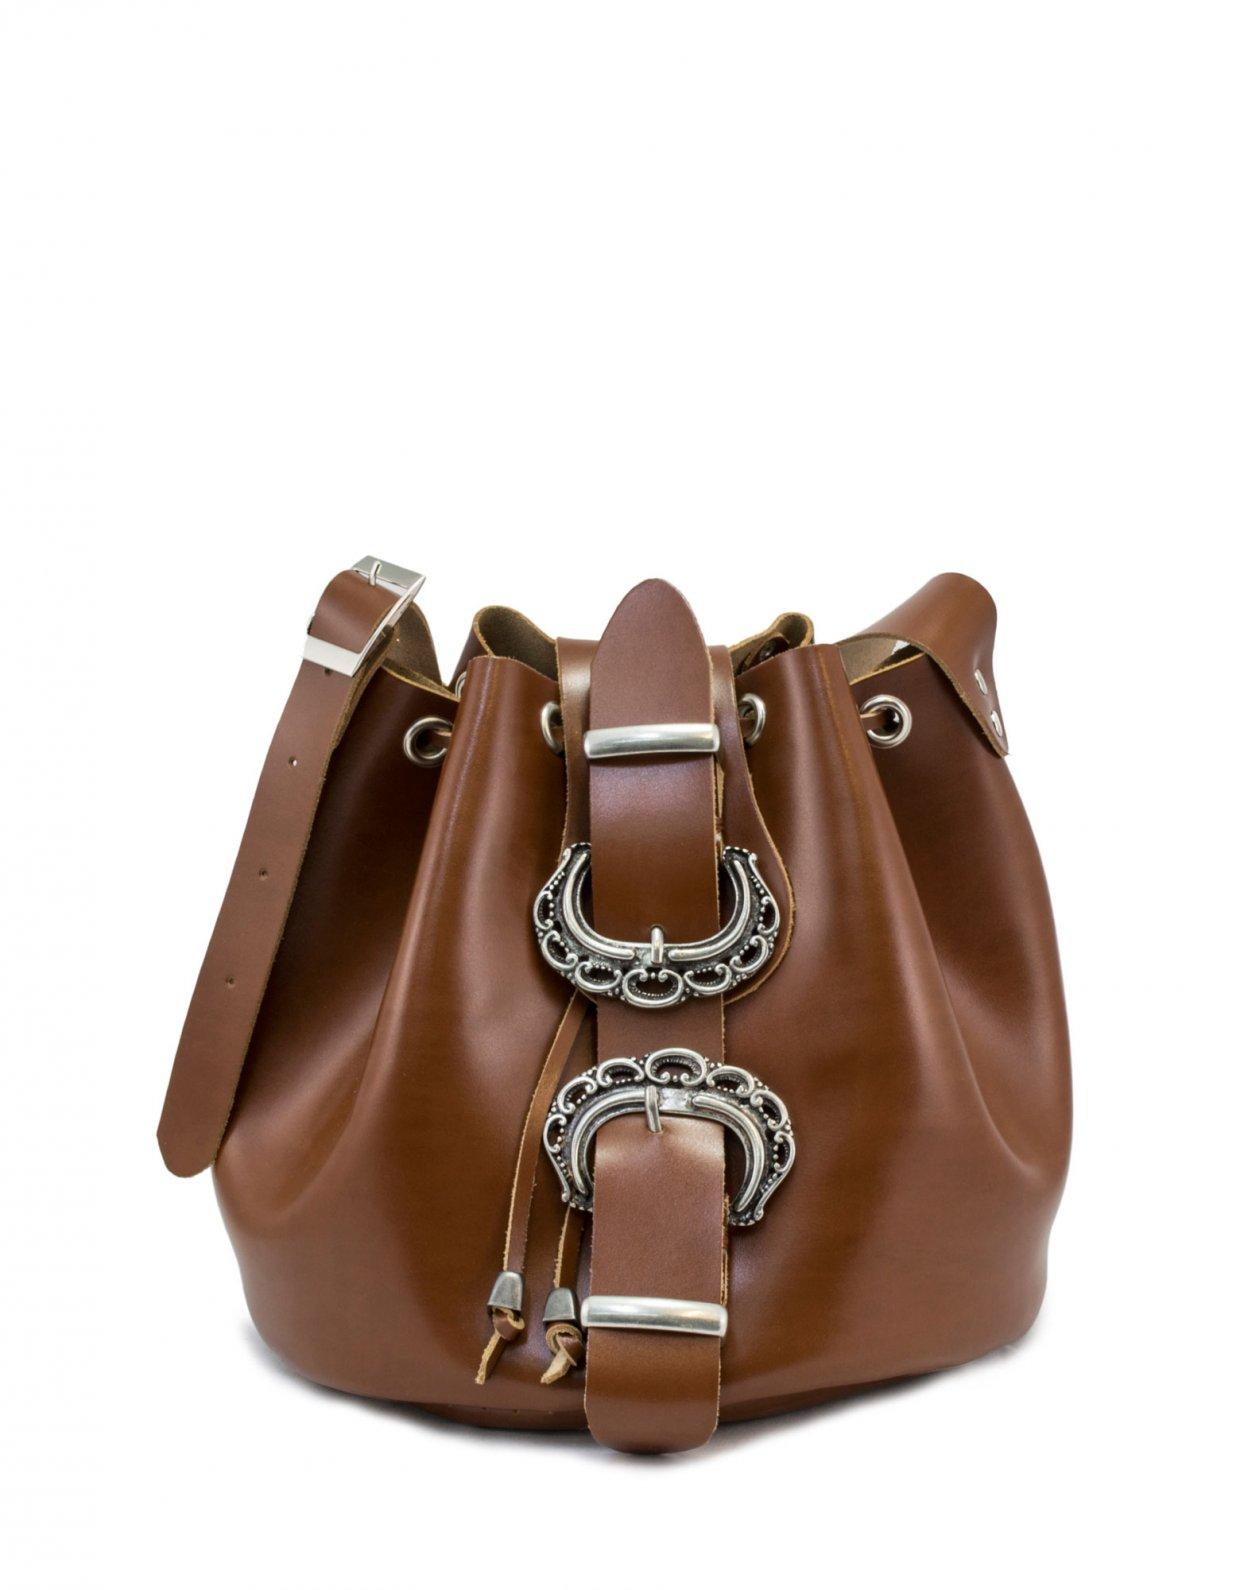 Individual Art Leather Everloving taba bag